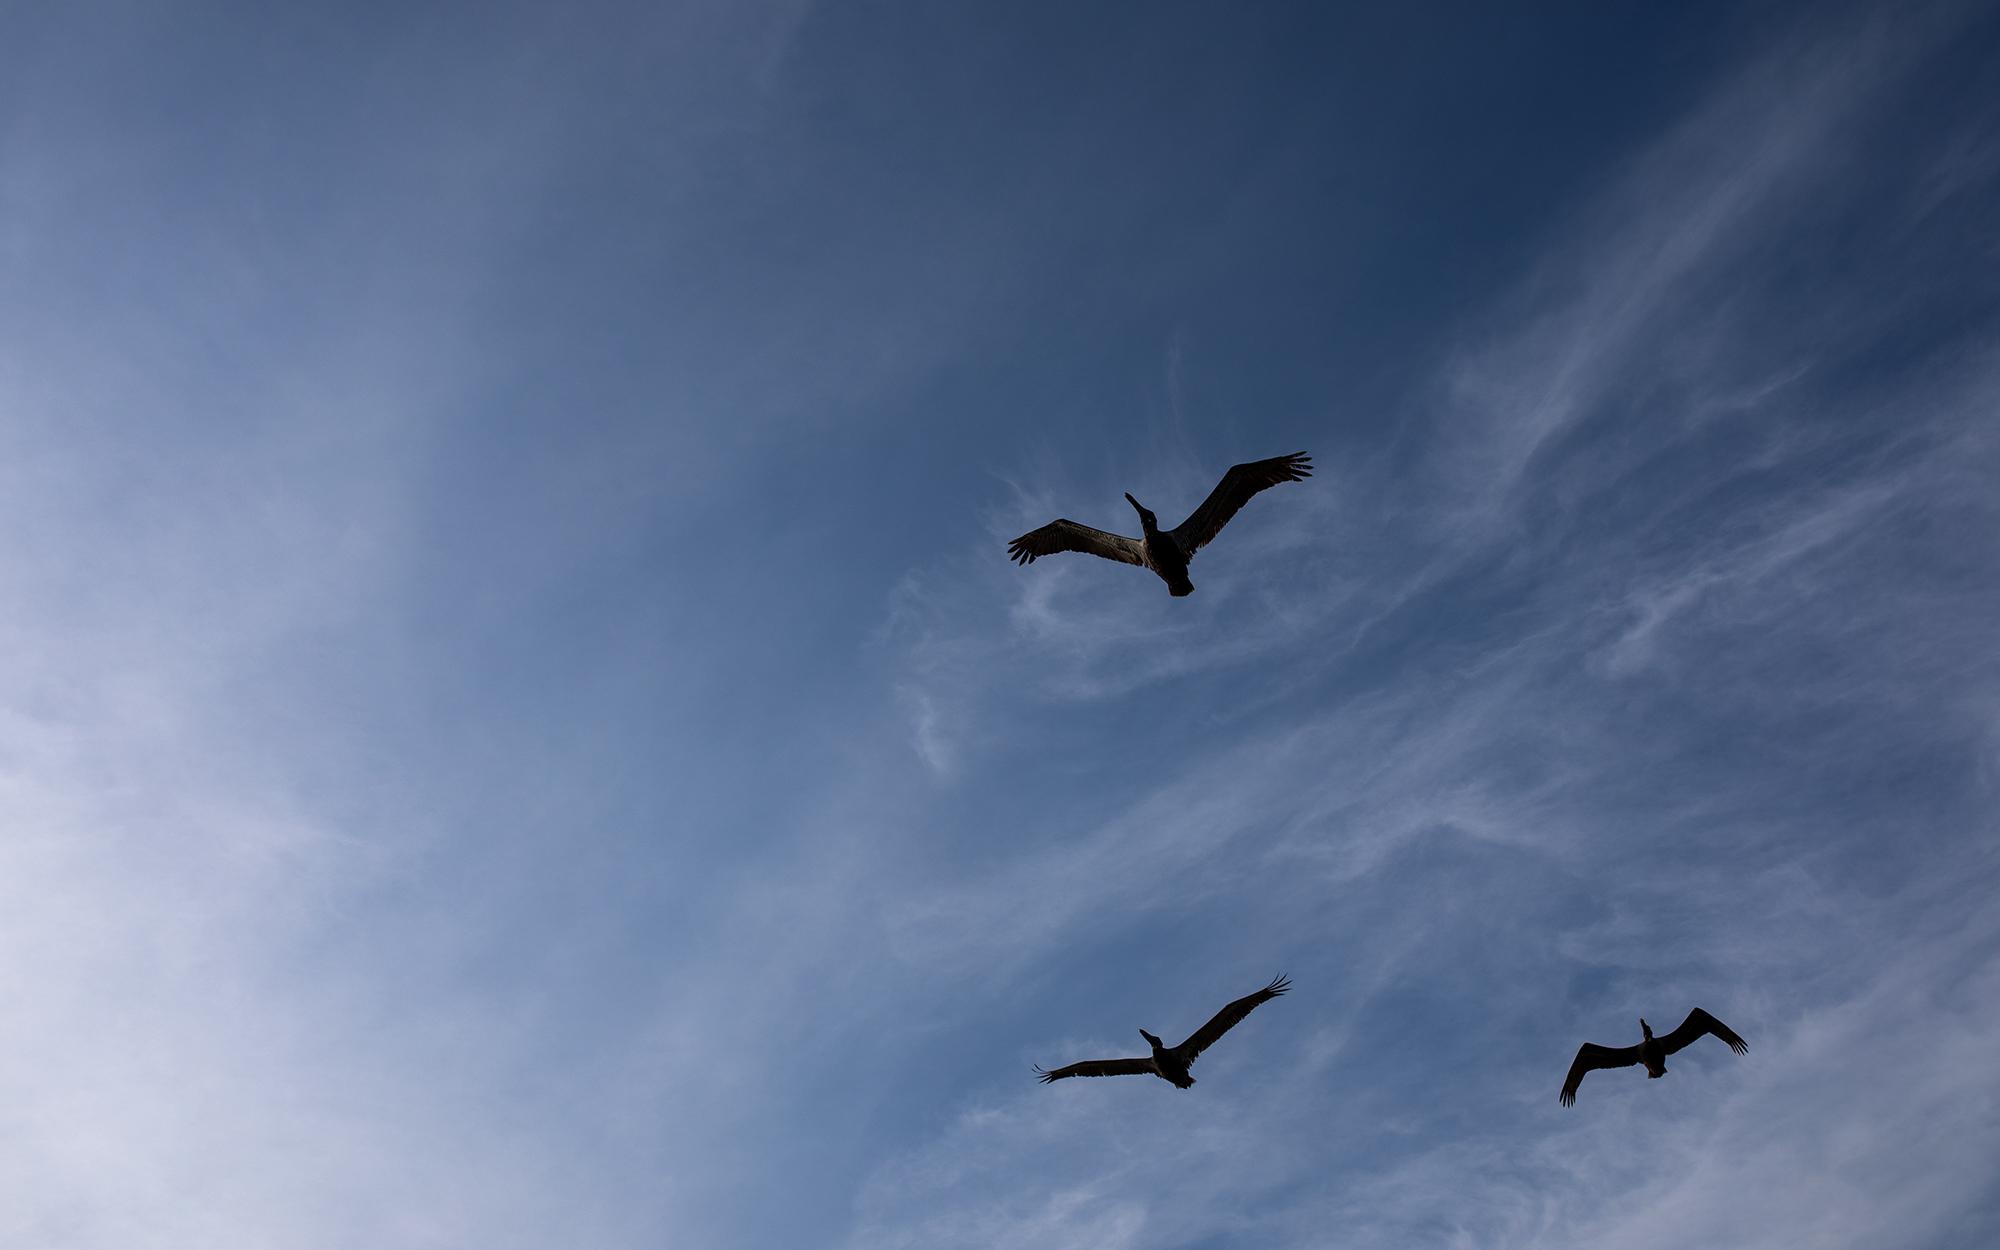 Brown pelicans get in formation. | Padre Island National Seashore, Texas | June 2018